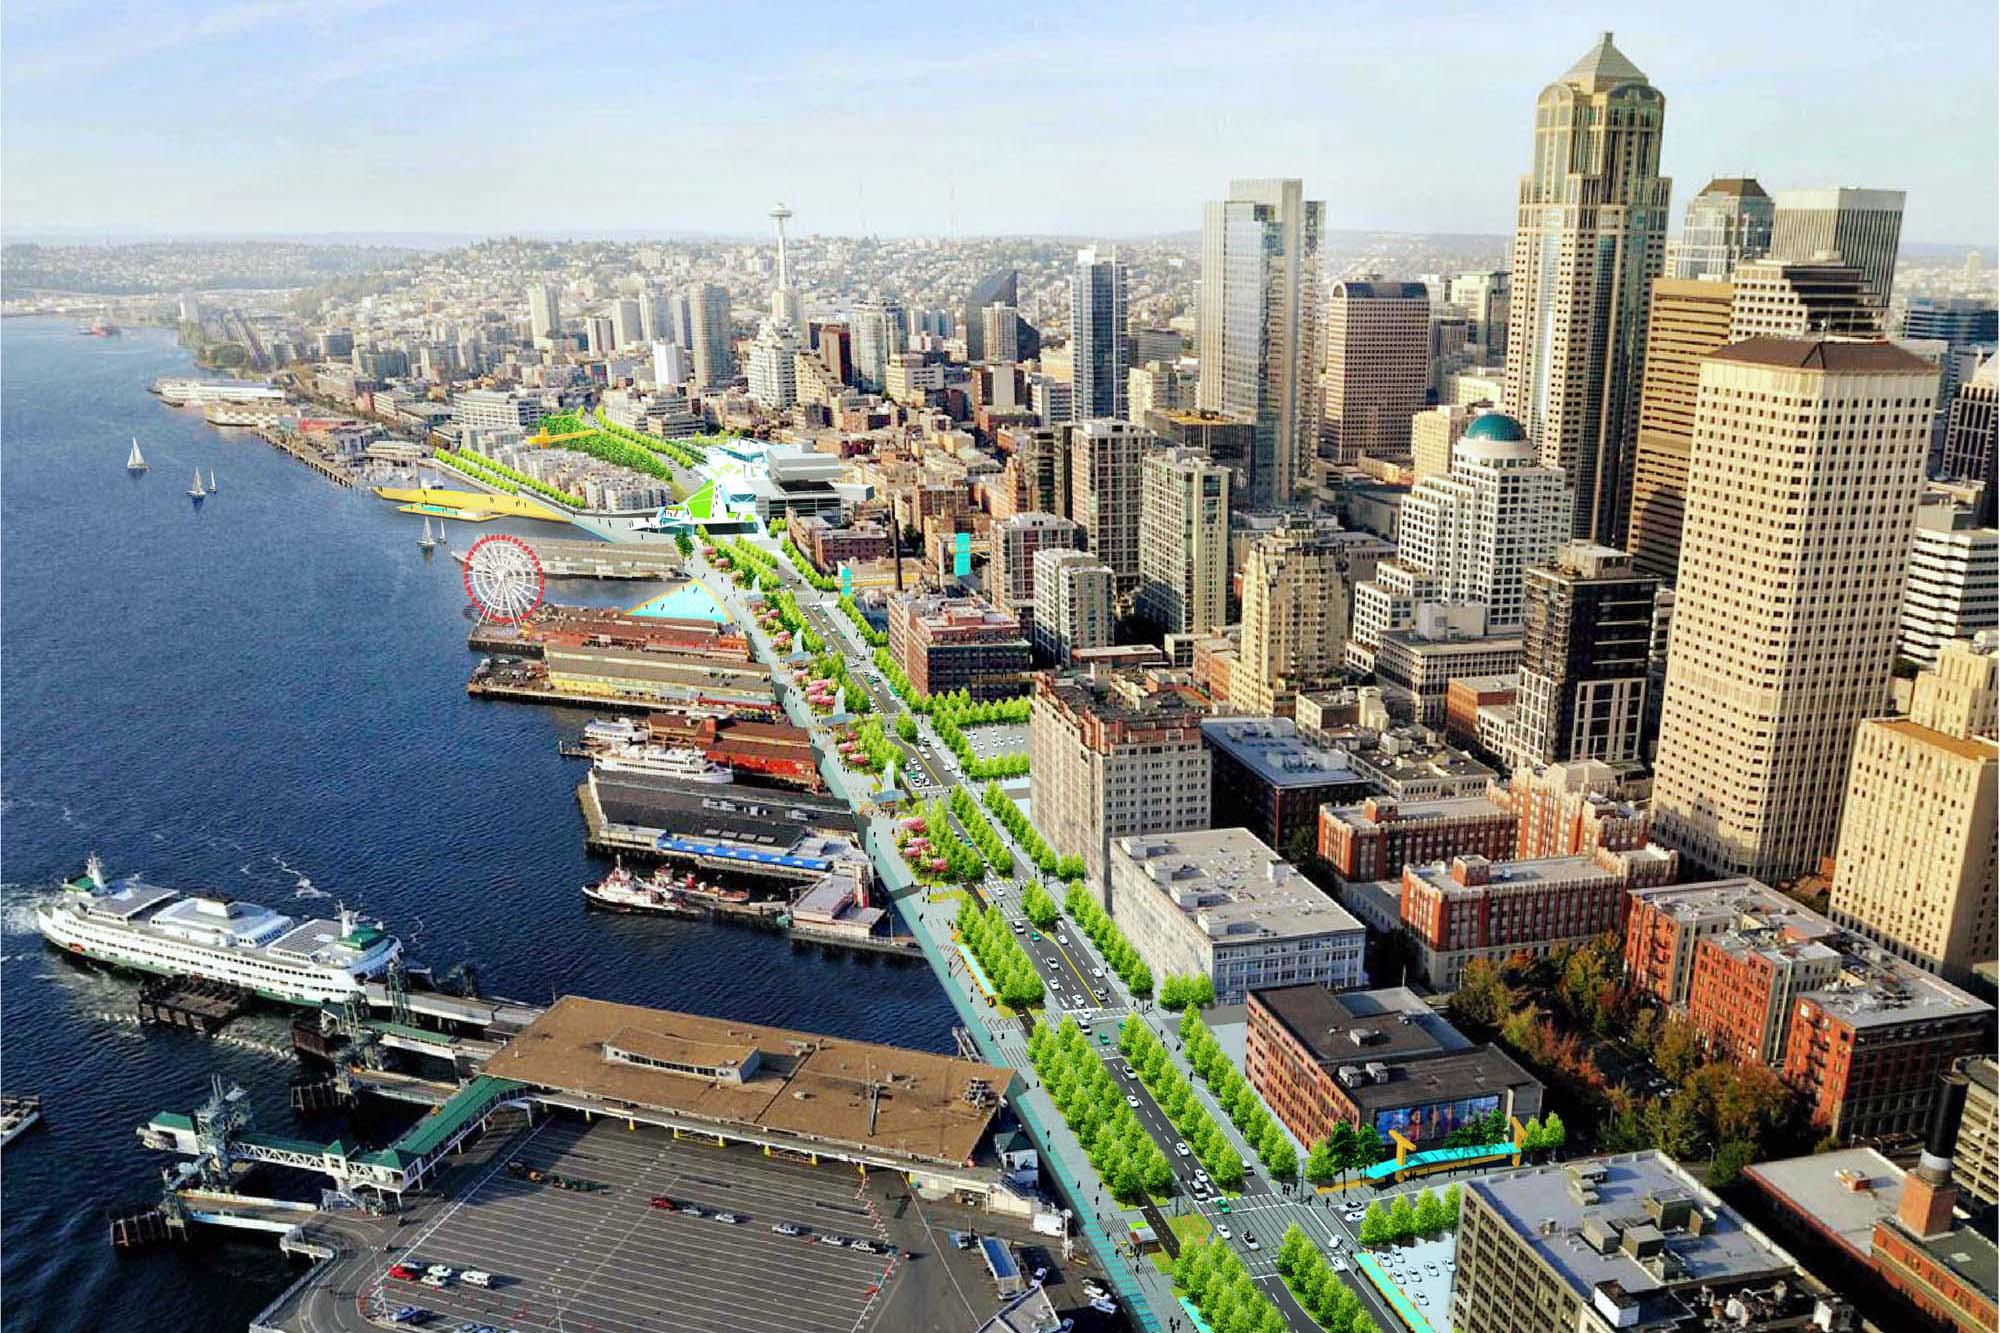 seattle central waterfront architect magazine james corner field